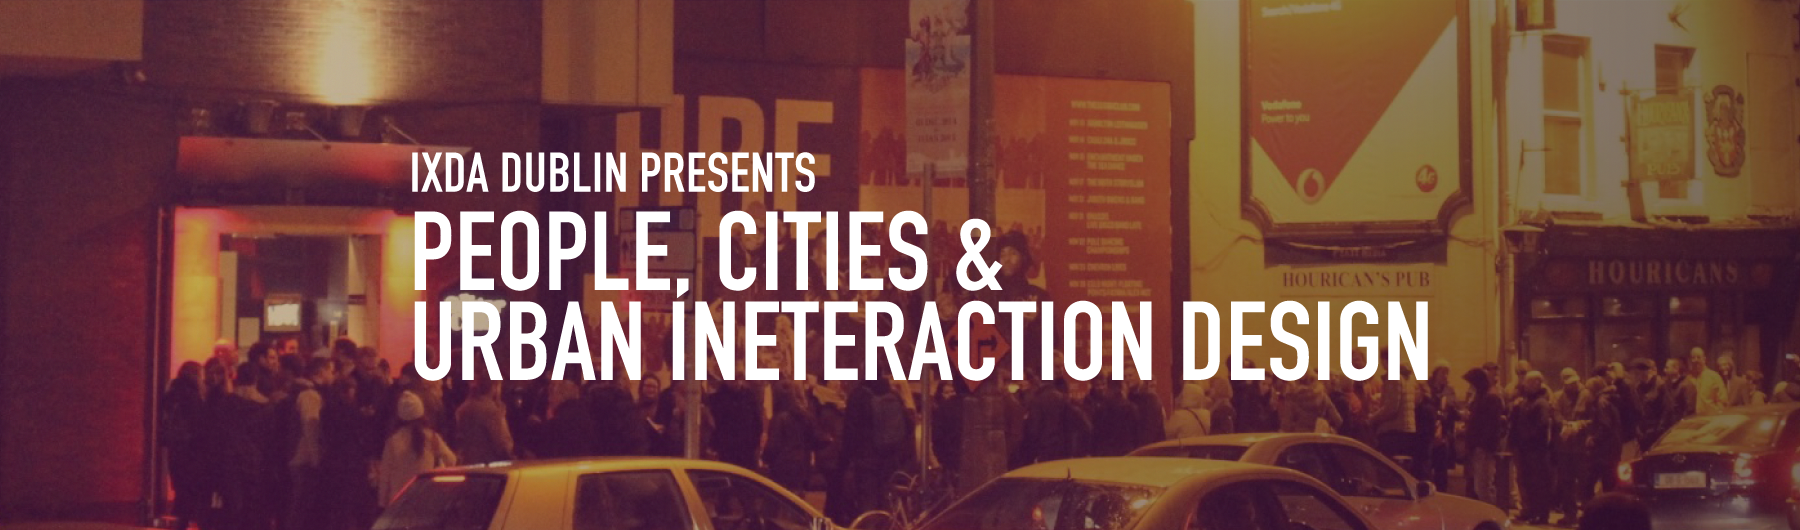 People, Cities & Urban Interaction Design